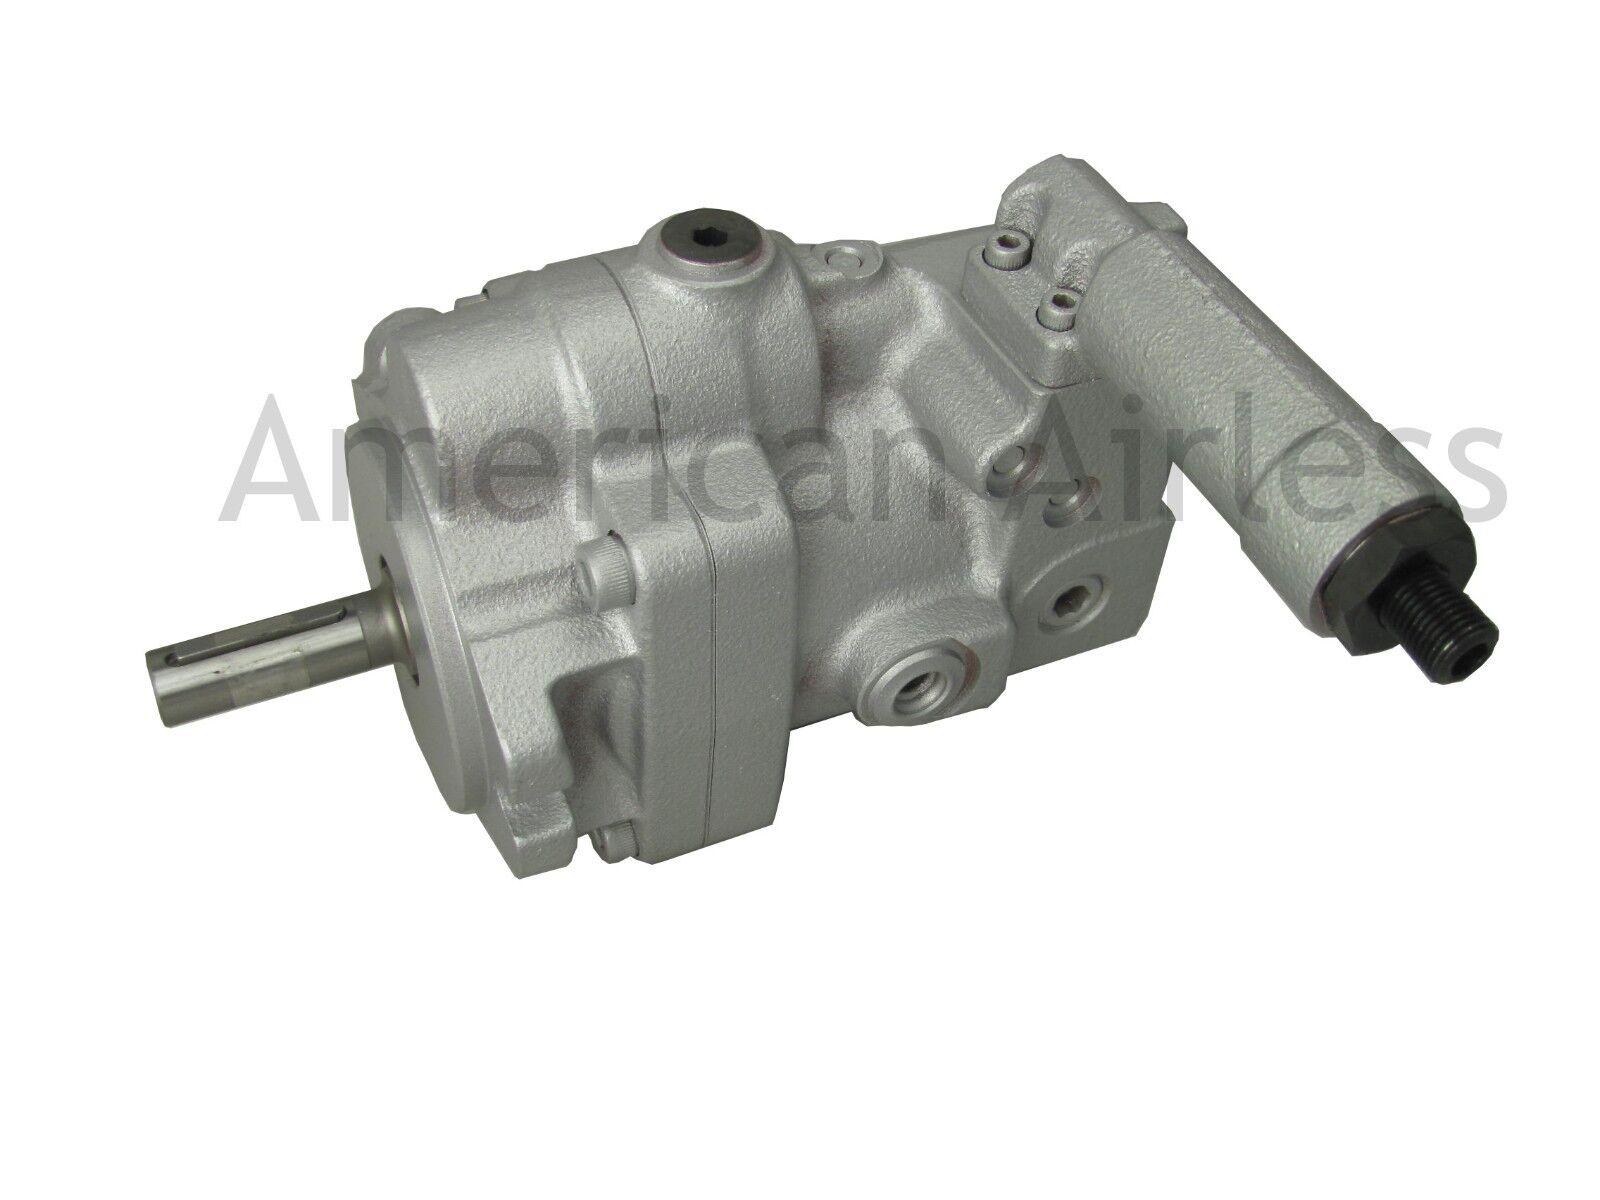 Titan Speeflo Hydraulic Pump 449-752A  449-752 Fits Speeflo 6900 6950 8900 8950